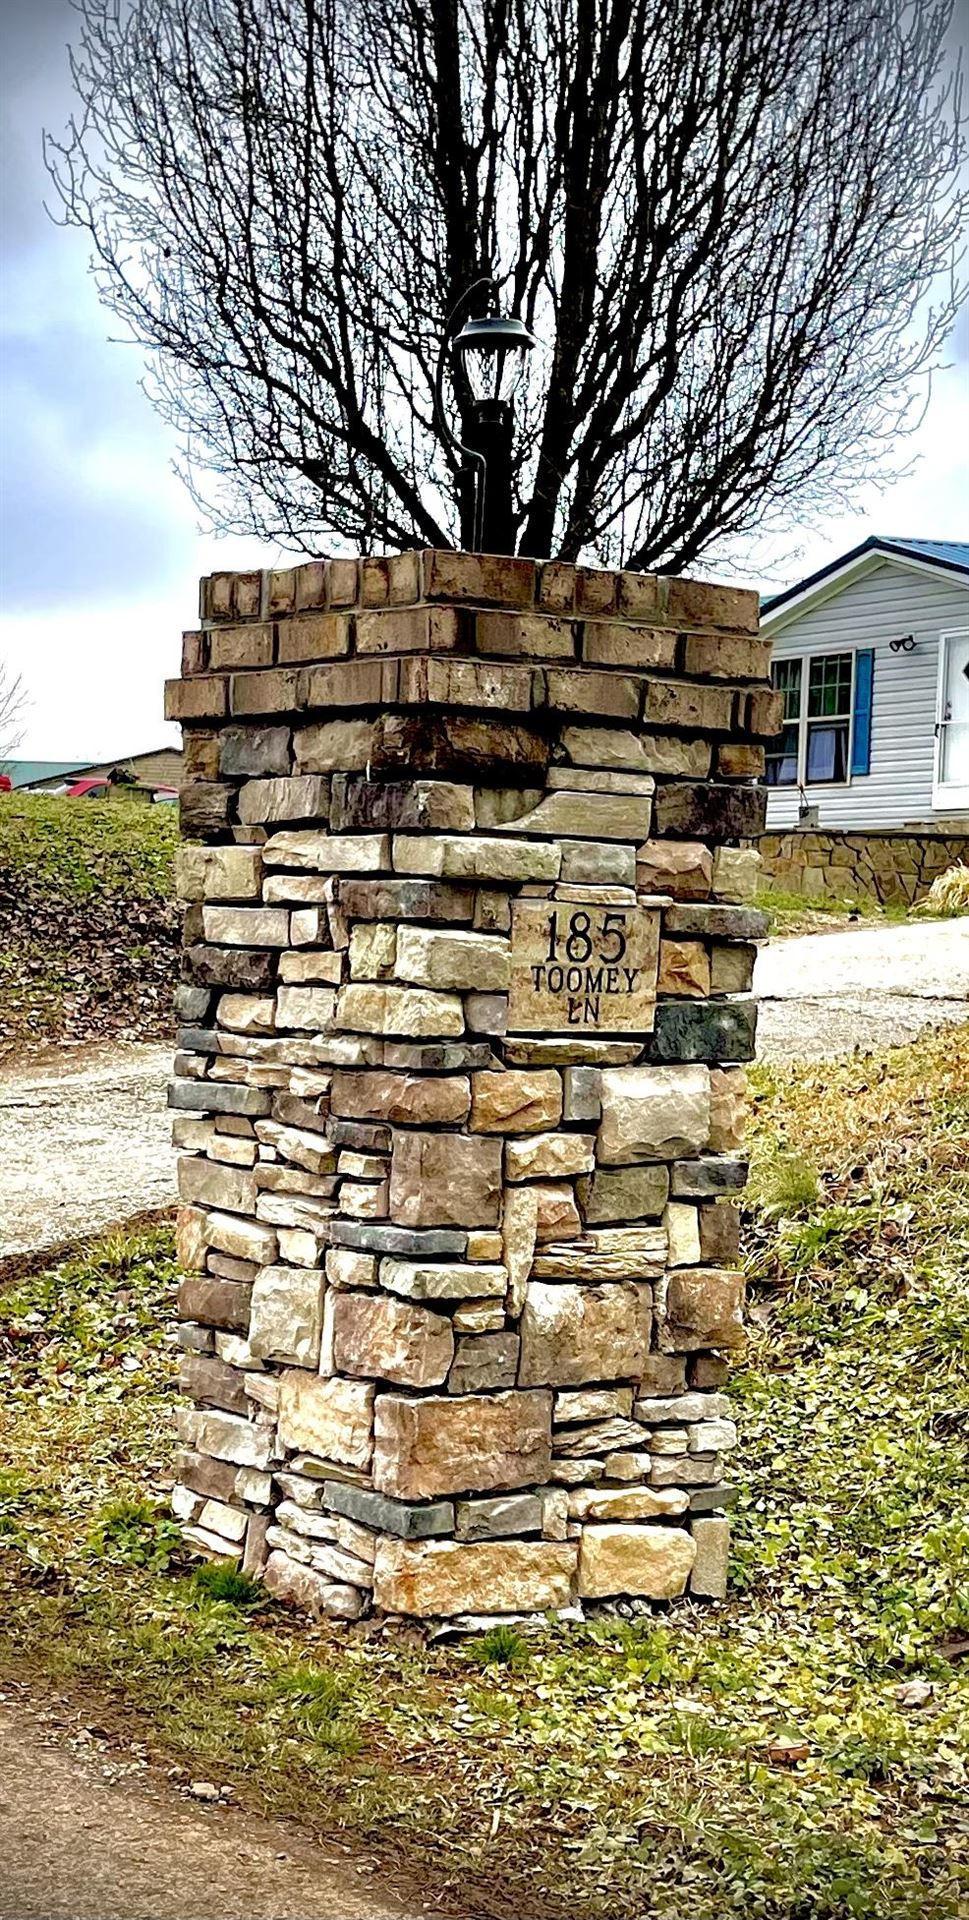 Photo of 185 Toomey Lane, Madisonville, TN 37354 (MLS # 1140139)